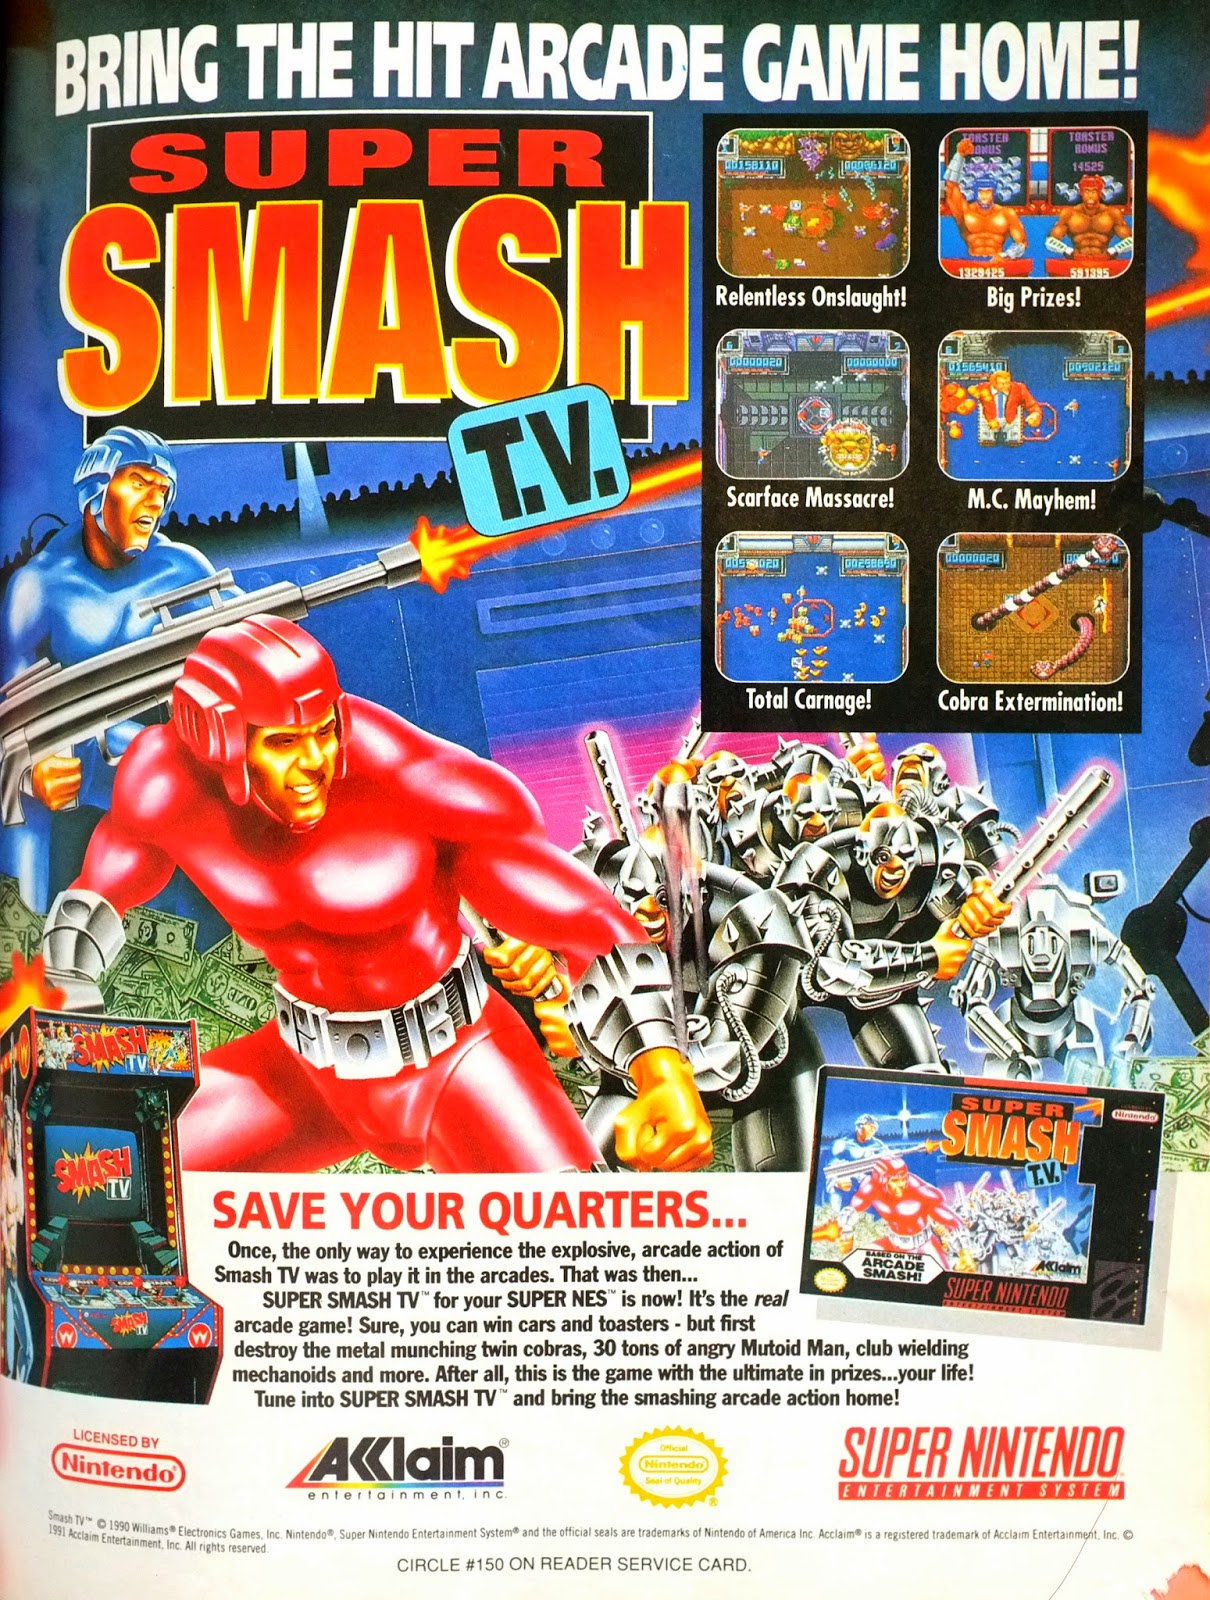 Super Smash TV for Super NES advertisement